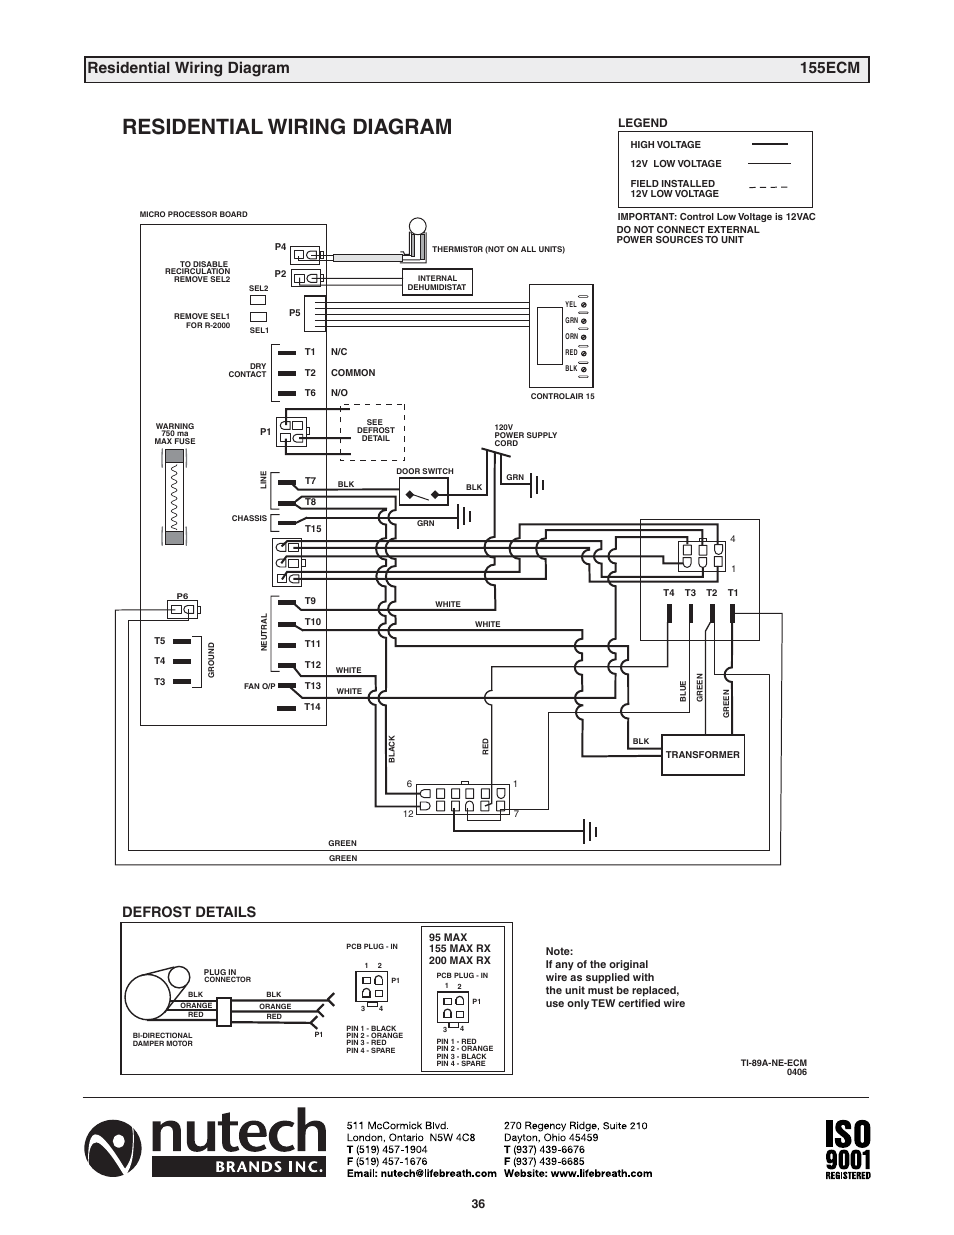 Residential Wiring Diagram 155ecm Damper Motor Defrost Details Lifebreath 200max Rx En User Manual Page 36